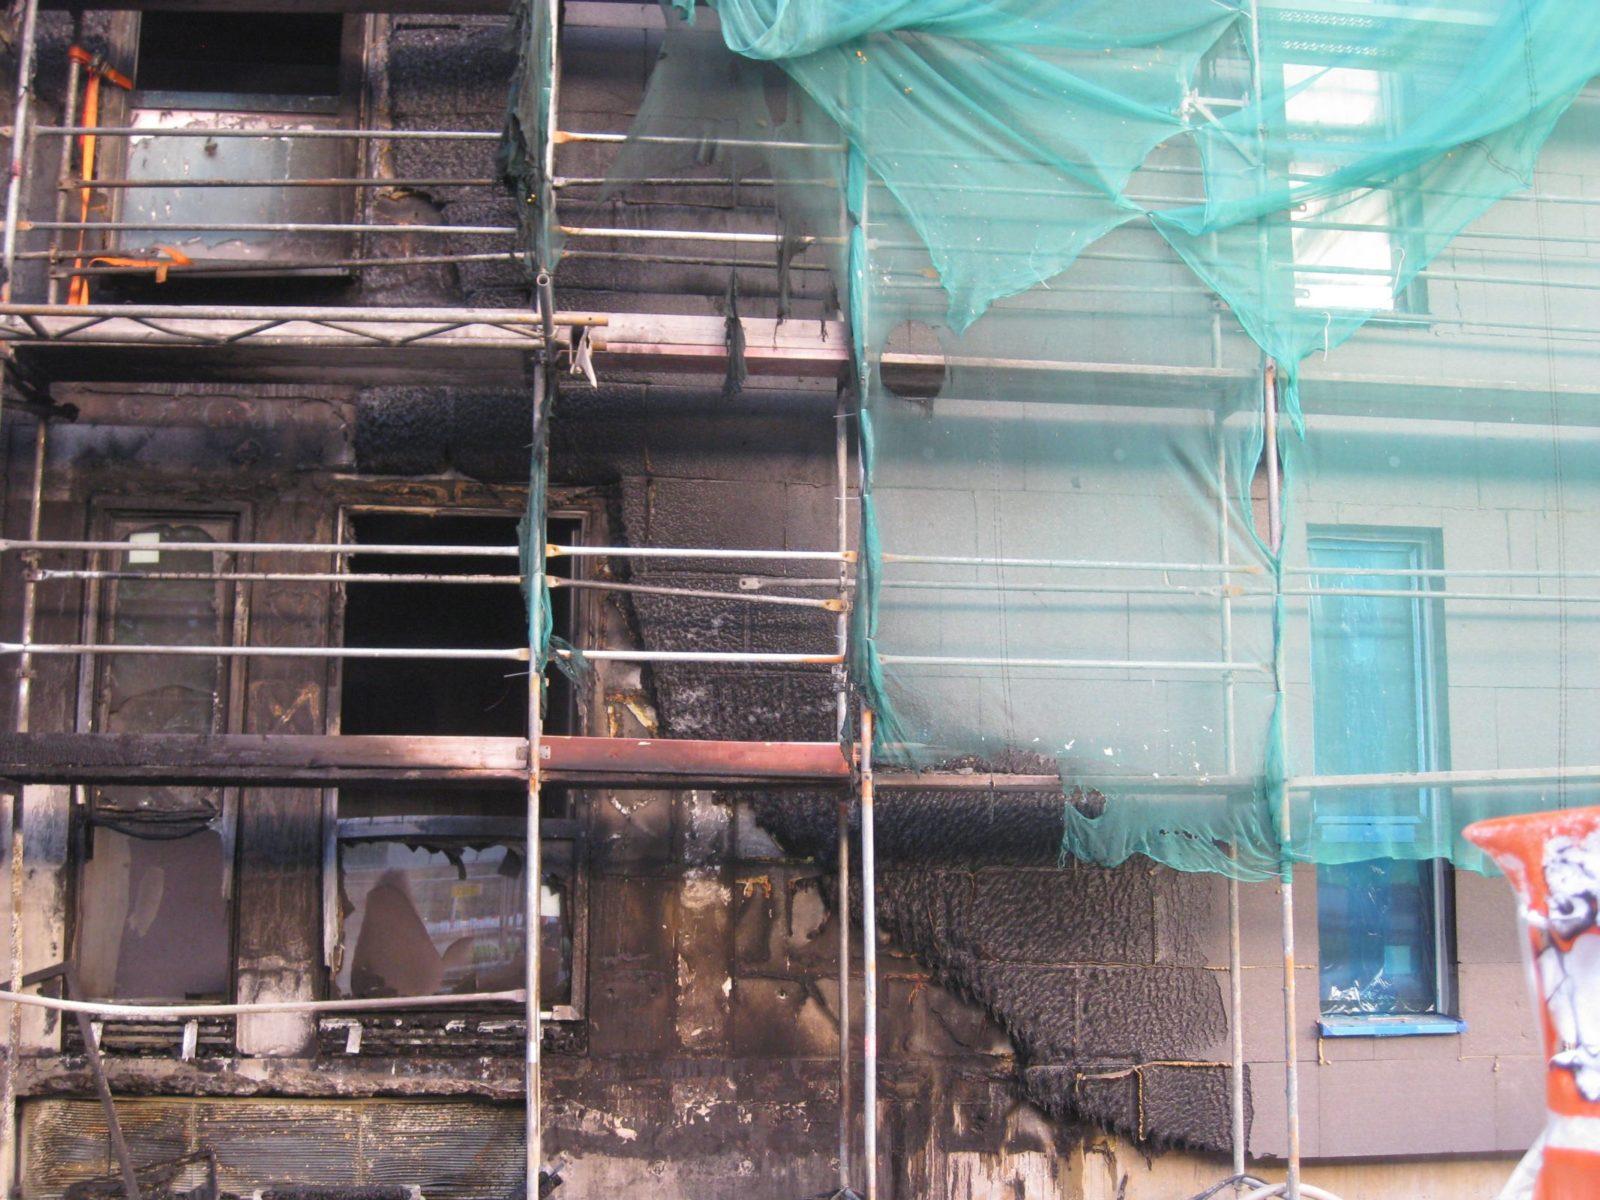 Zerstörtes WDVS_Nach dem Fassadenbrand auf Frankfurter Baustelle Foto_Karl-Olaf Kaiser